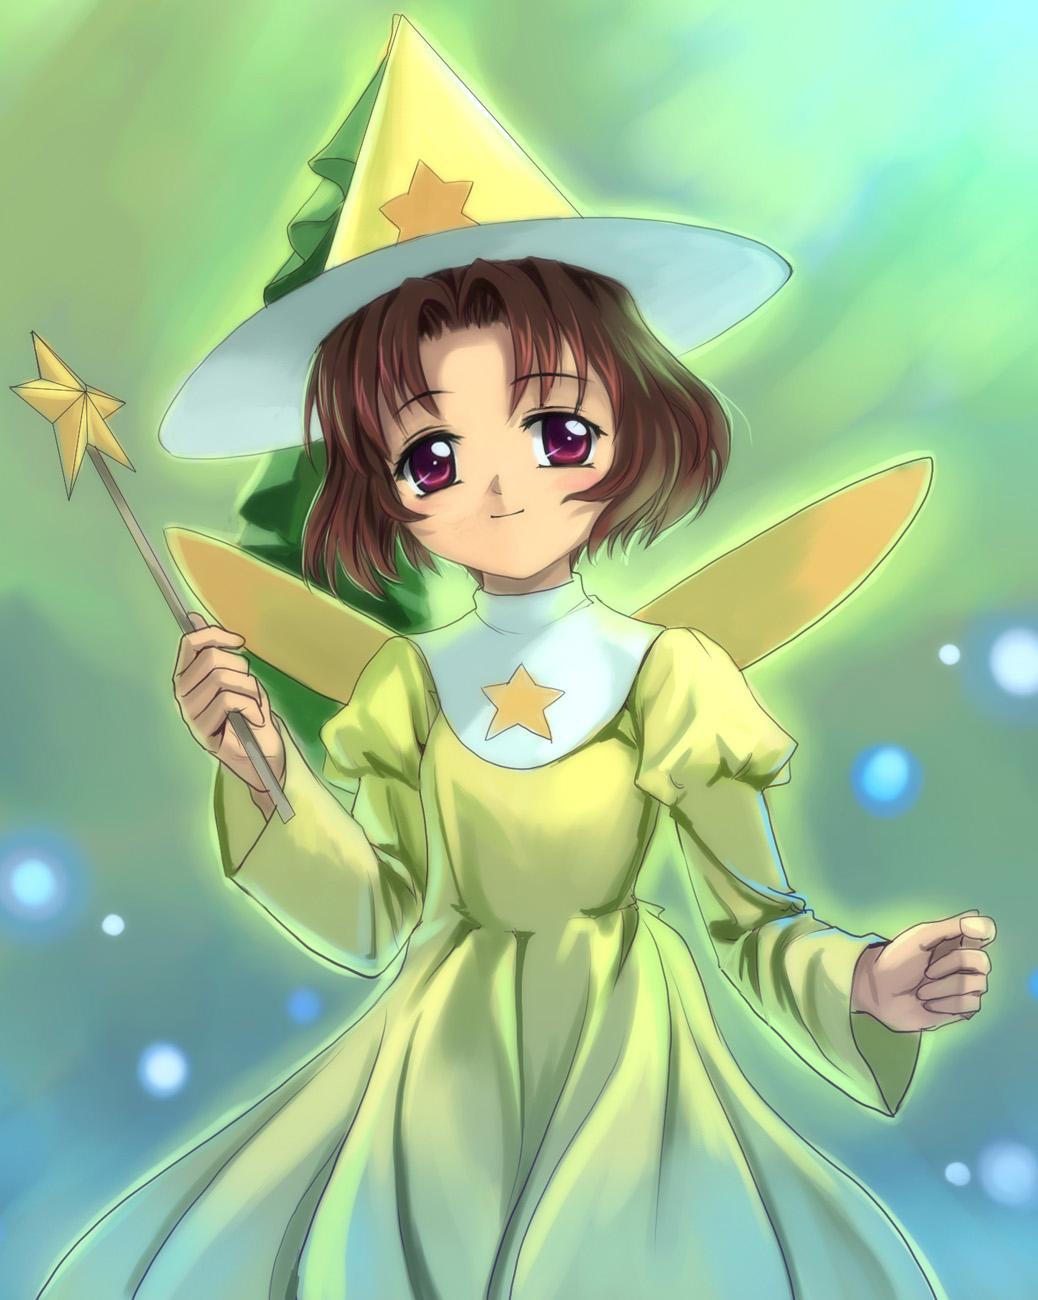 sasaki rika   cardcaptor sakura   zerochan anime image board